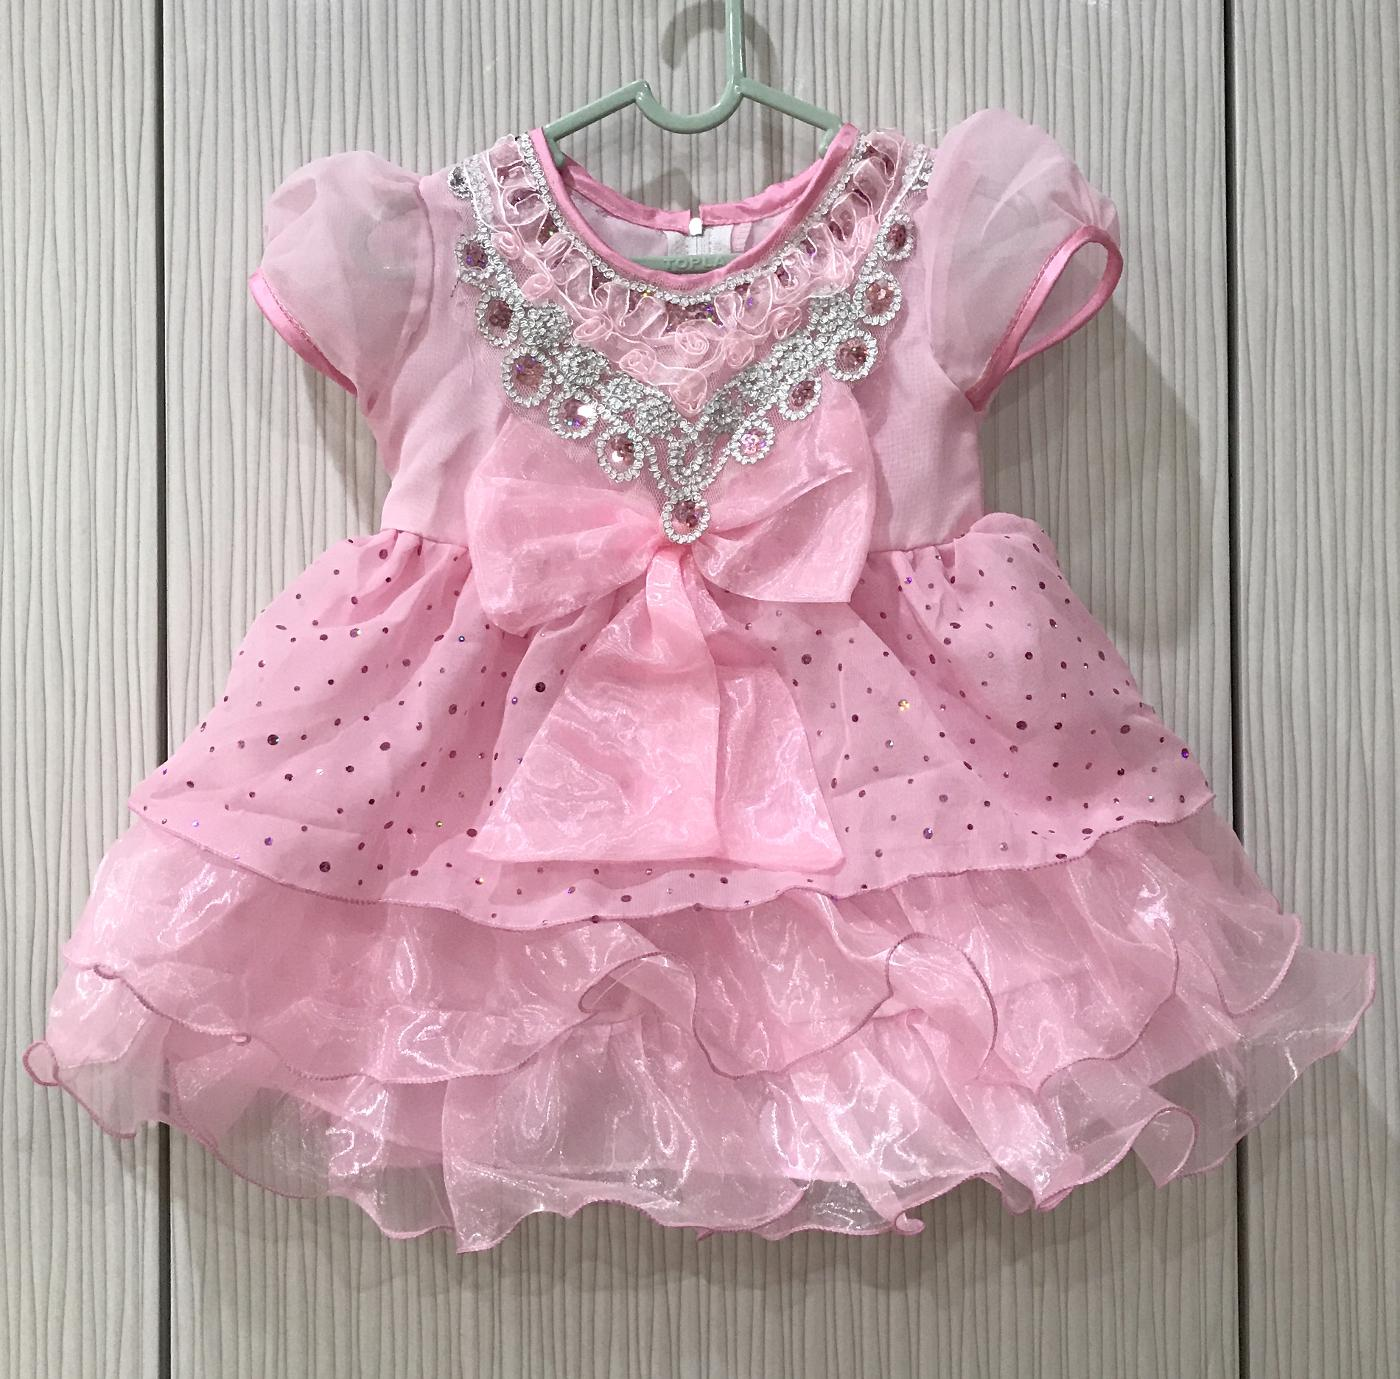 BAYIe - Baju Bayi Pesta Anak Perempuan model Pita Besar umur 1 - 2 tahun PANCA INDAH/Dress Gaun Pesta anak cewek